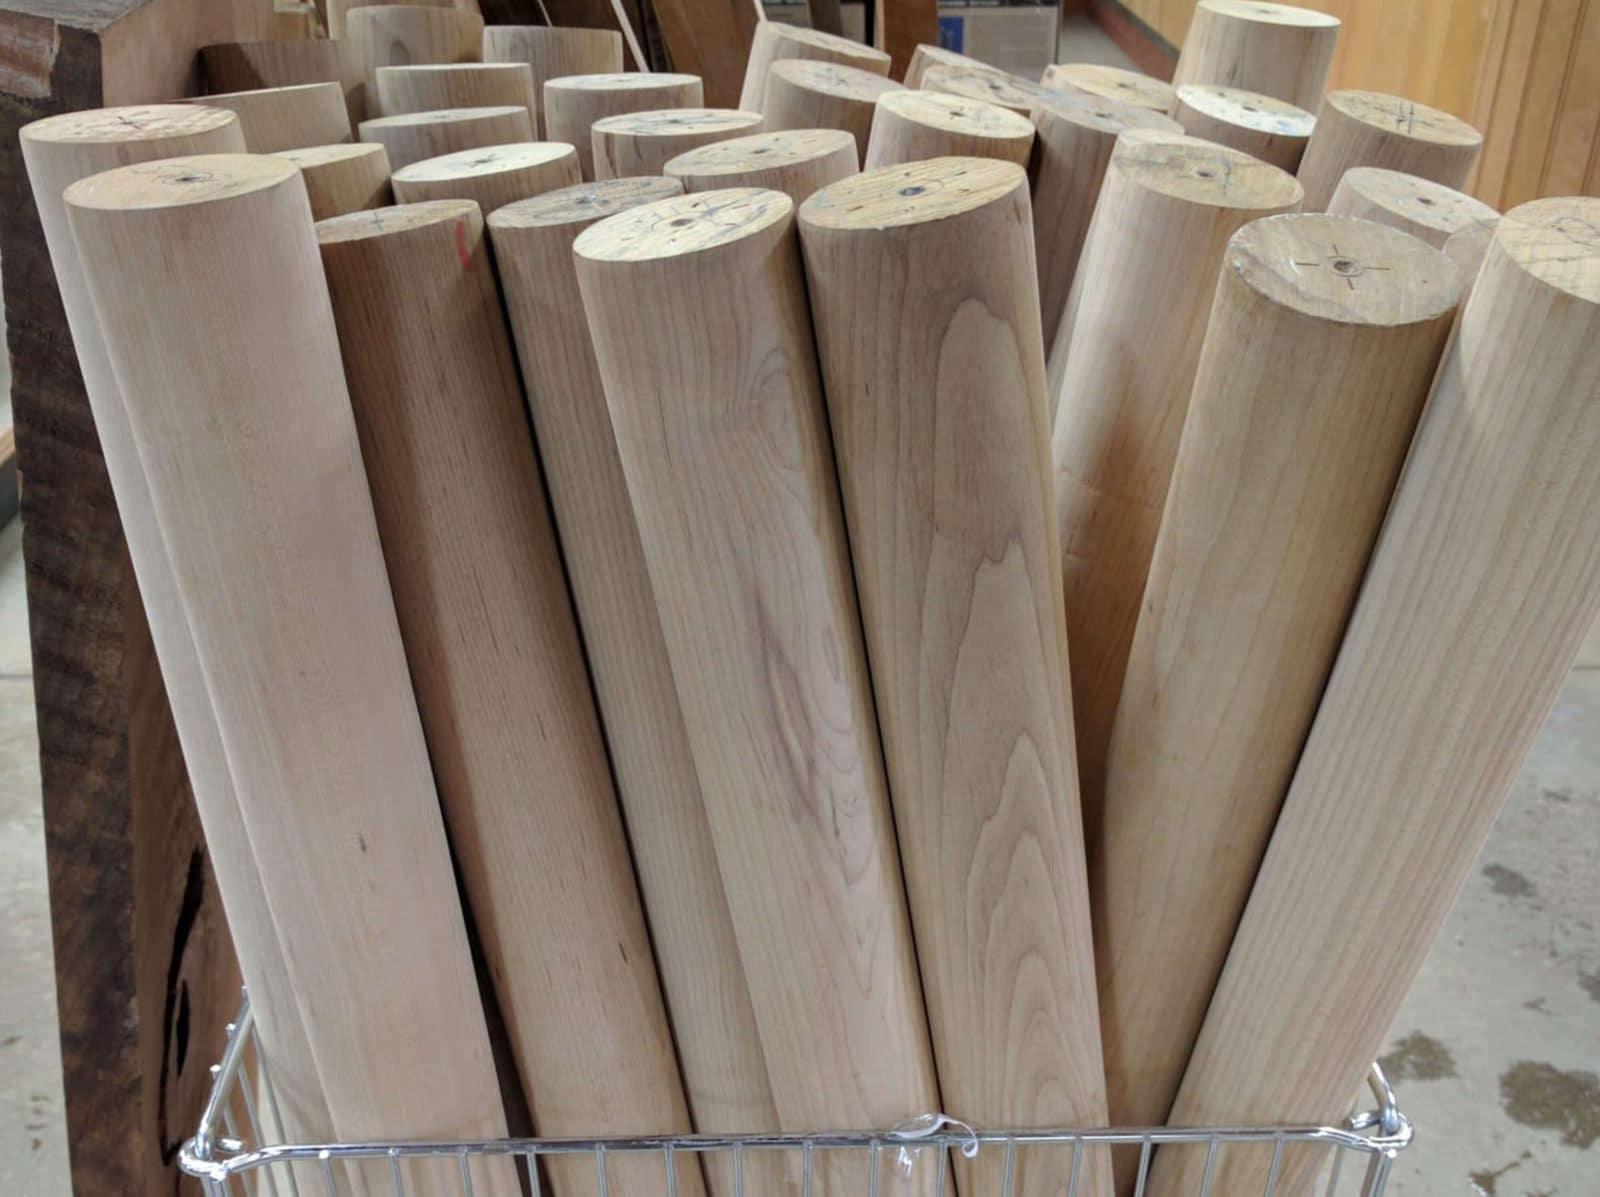 Wood Bat Blanks For Sale